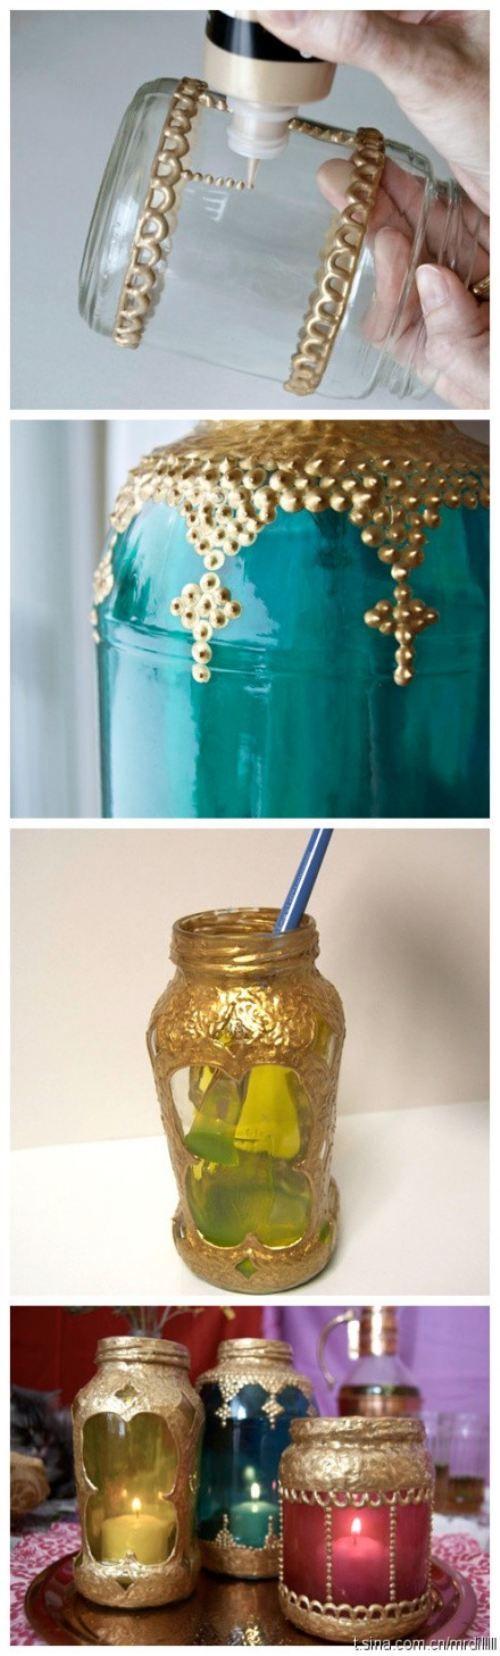 DIY Lanterns/Candle Holders